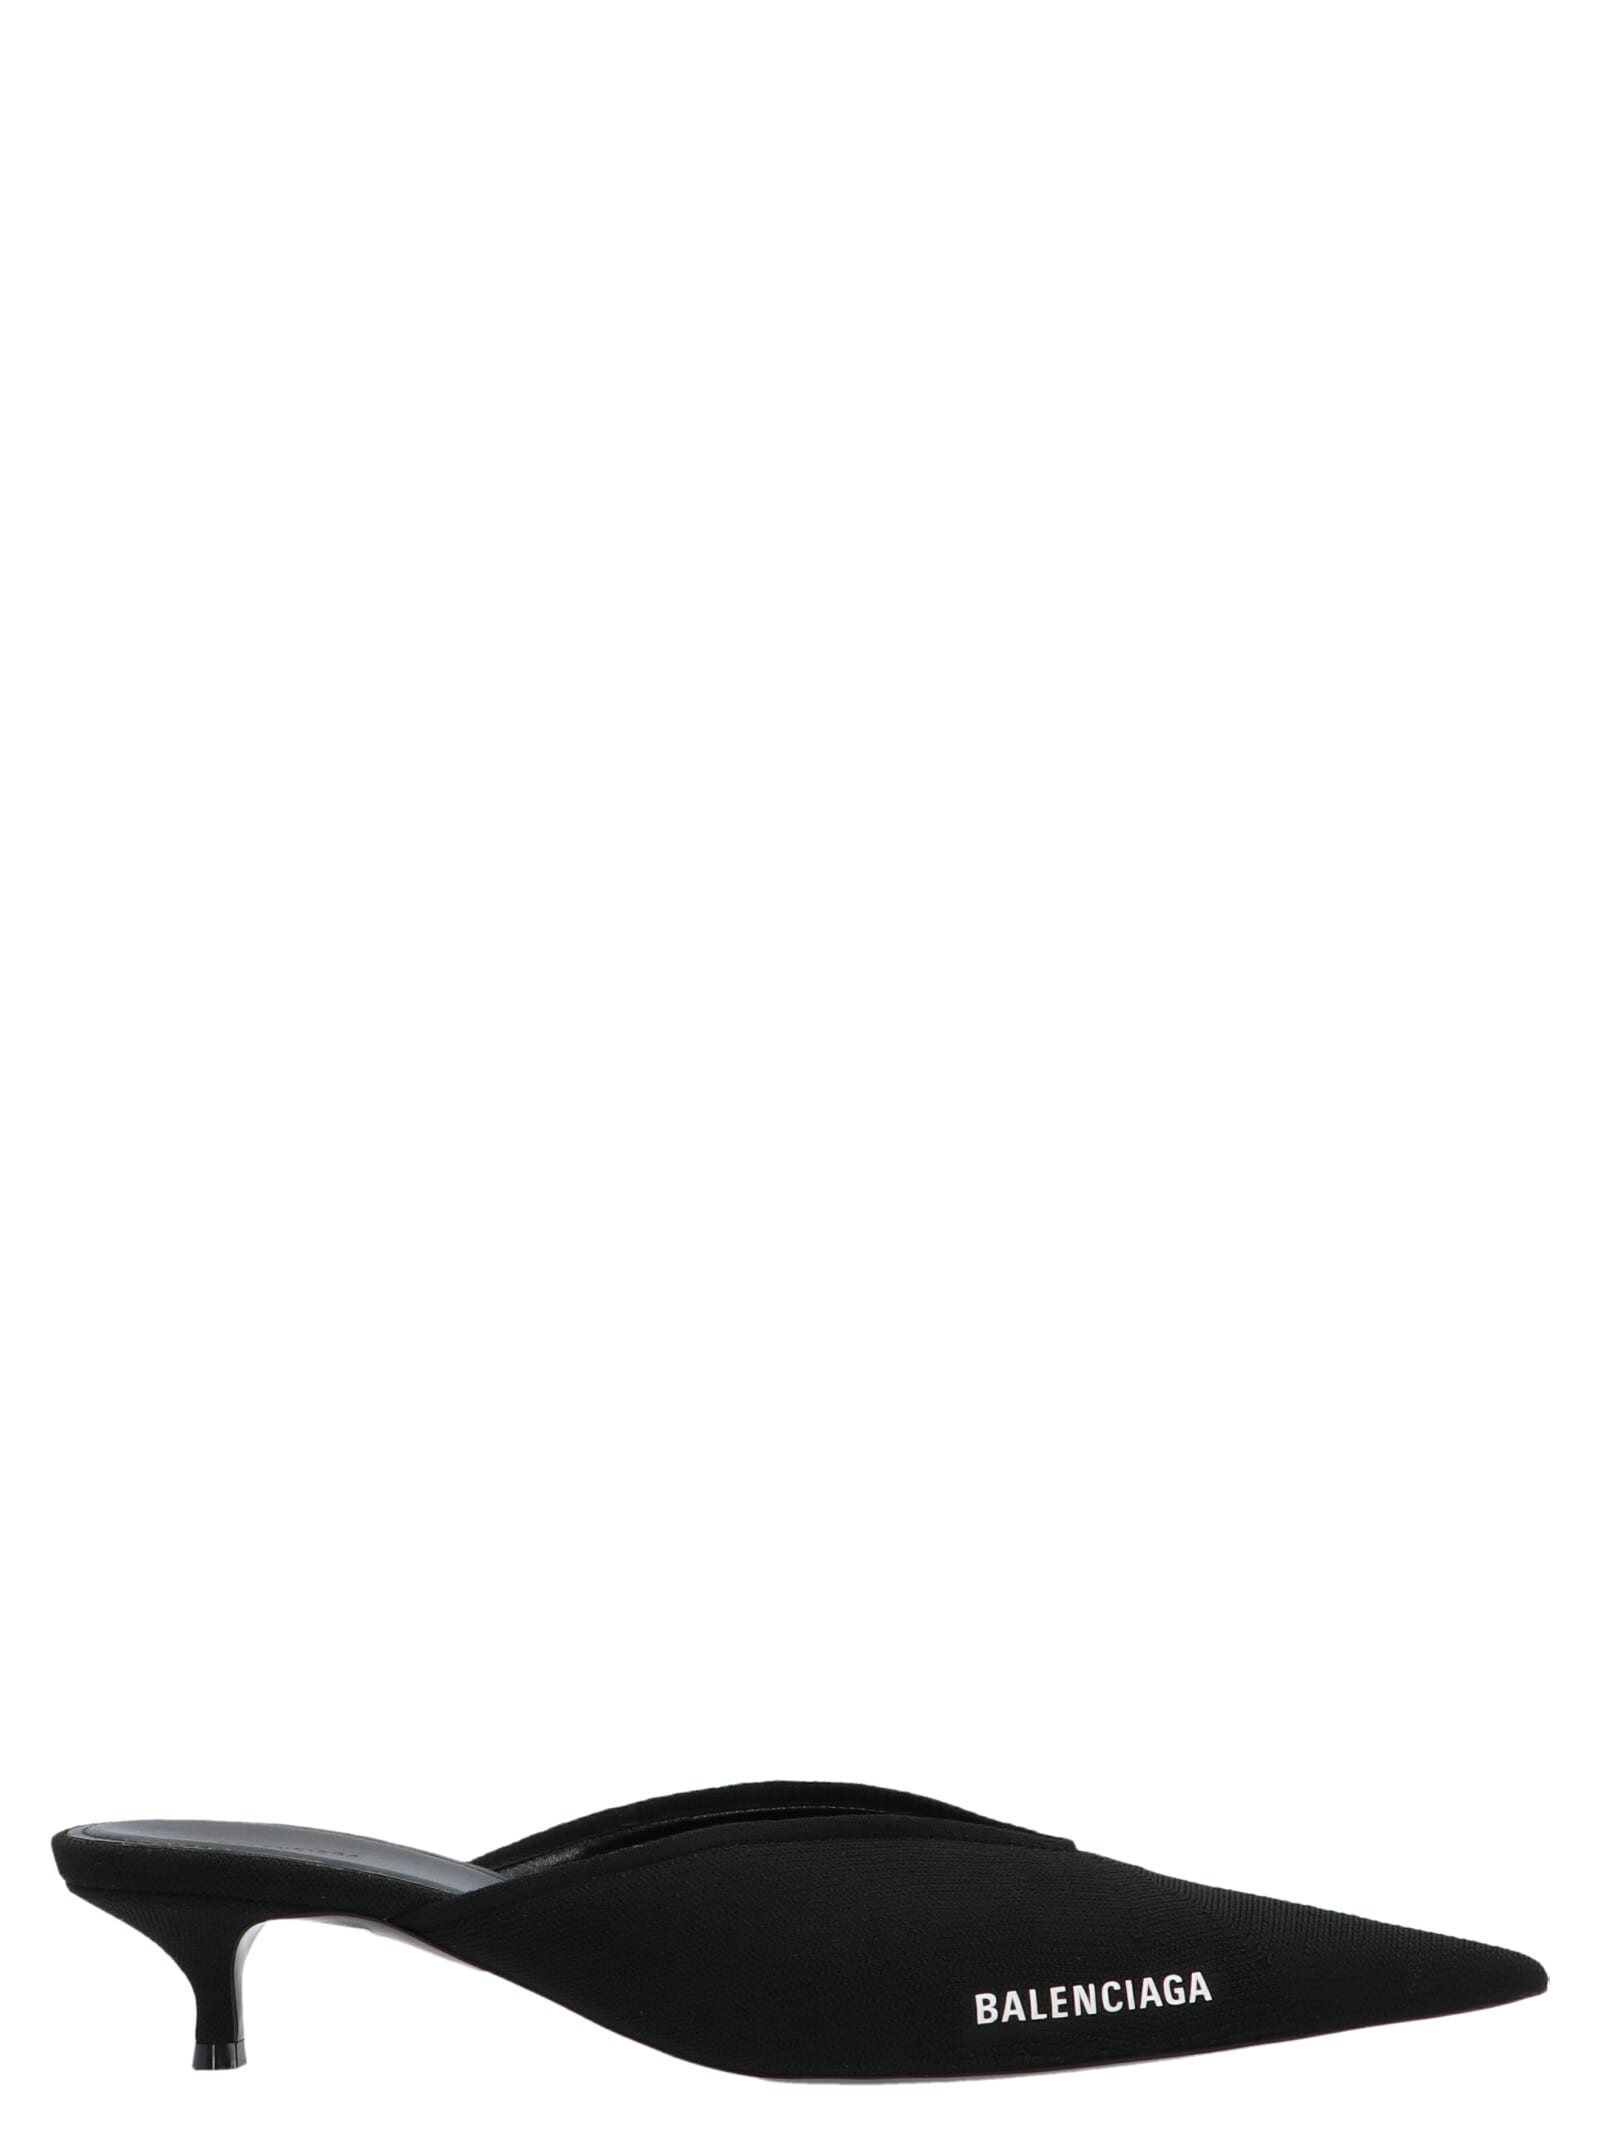 Balenciaga knife Shoes